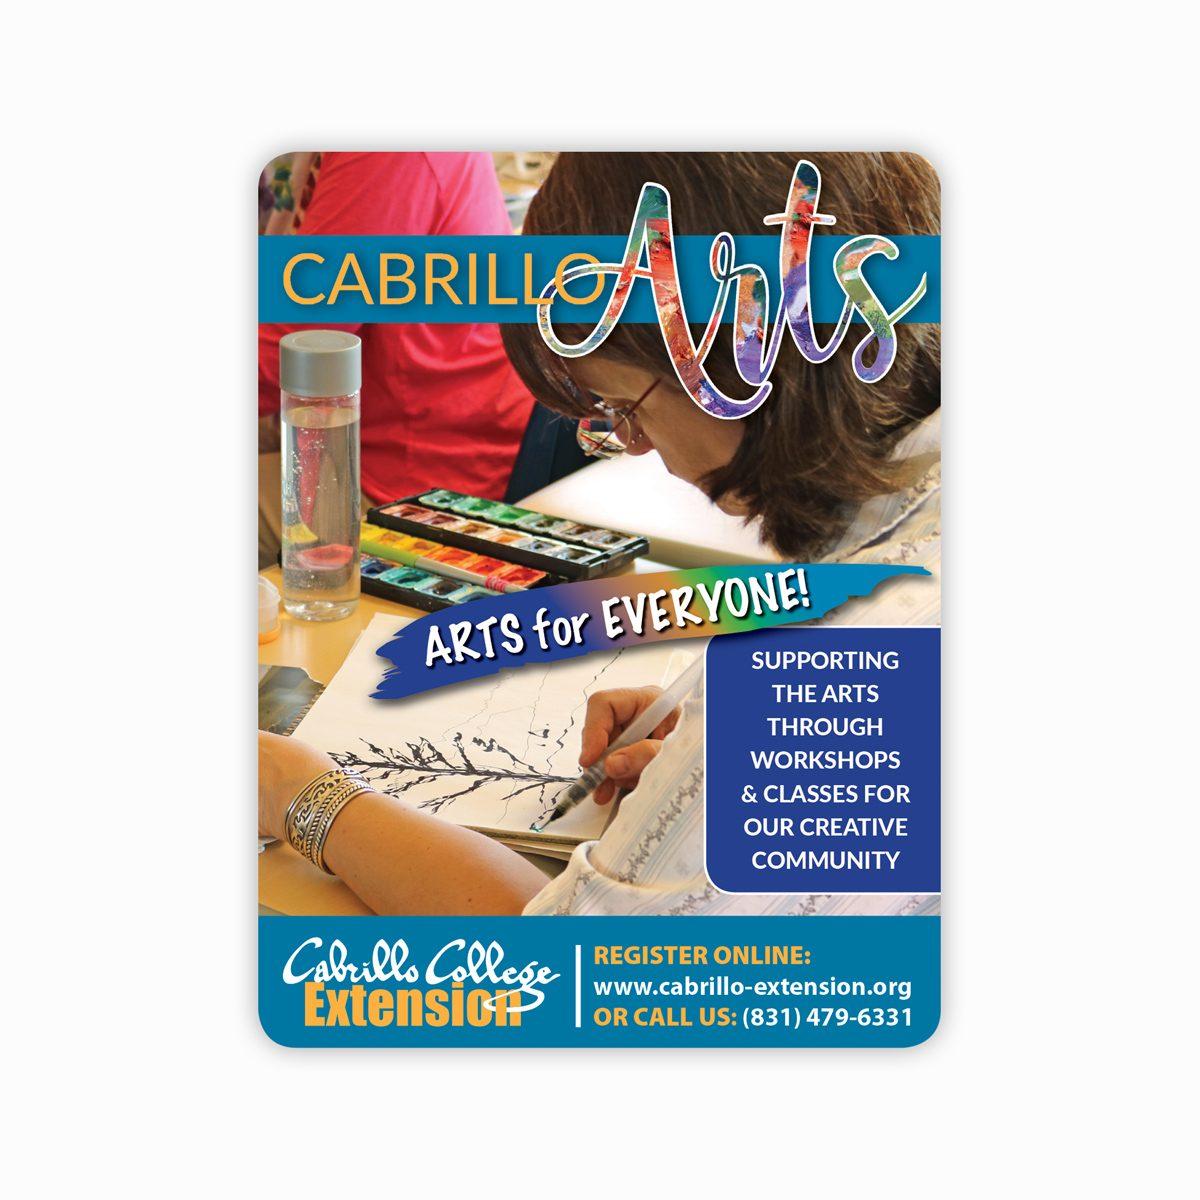 Cabrillo Arts ad for Open Studios Santa Cruz publication